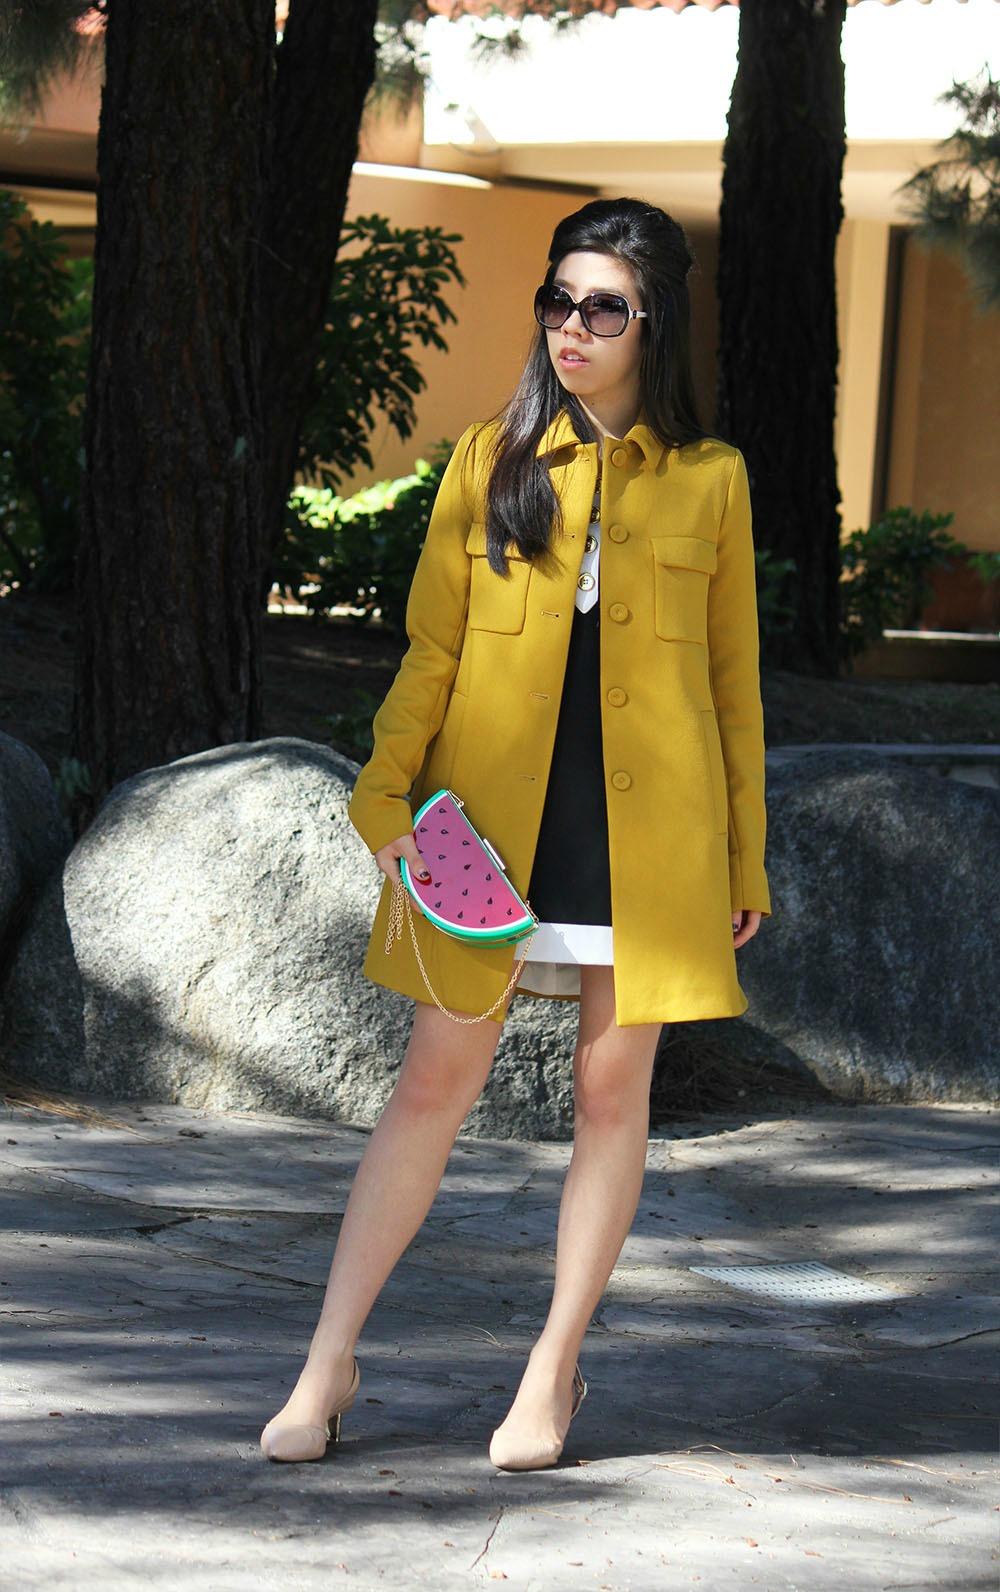 Adrienne Nguyen_invictus_Fashion blogger_Student Fashion_Student style_UCSD